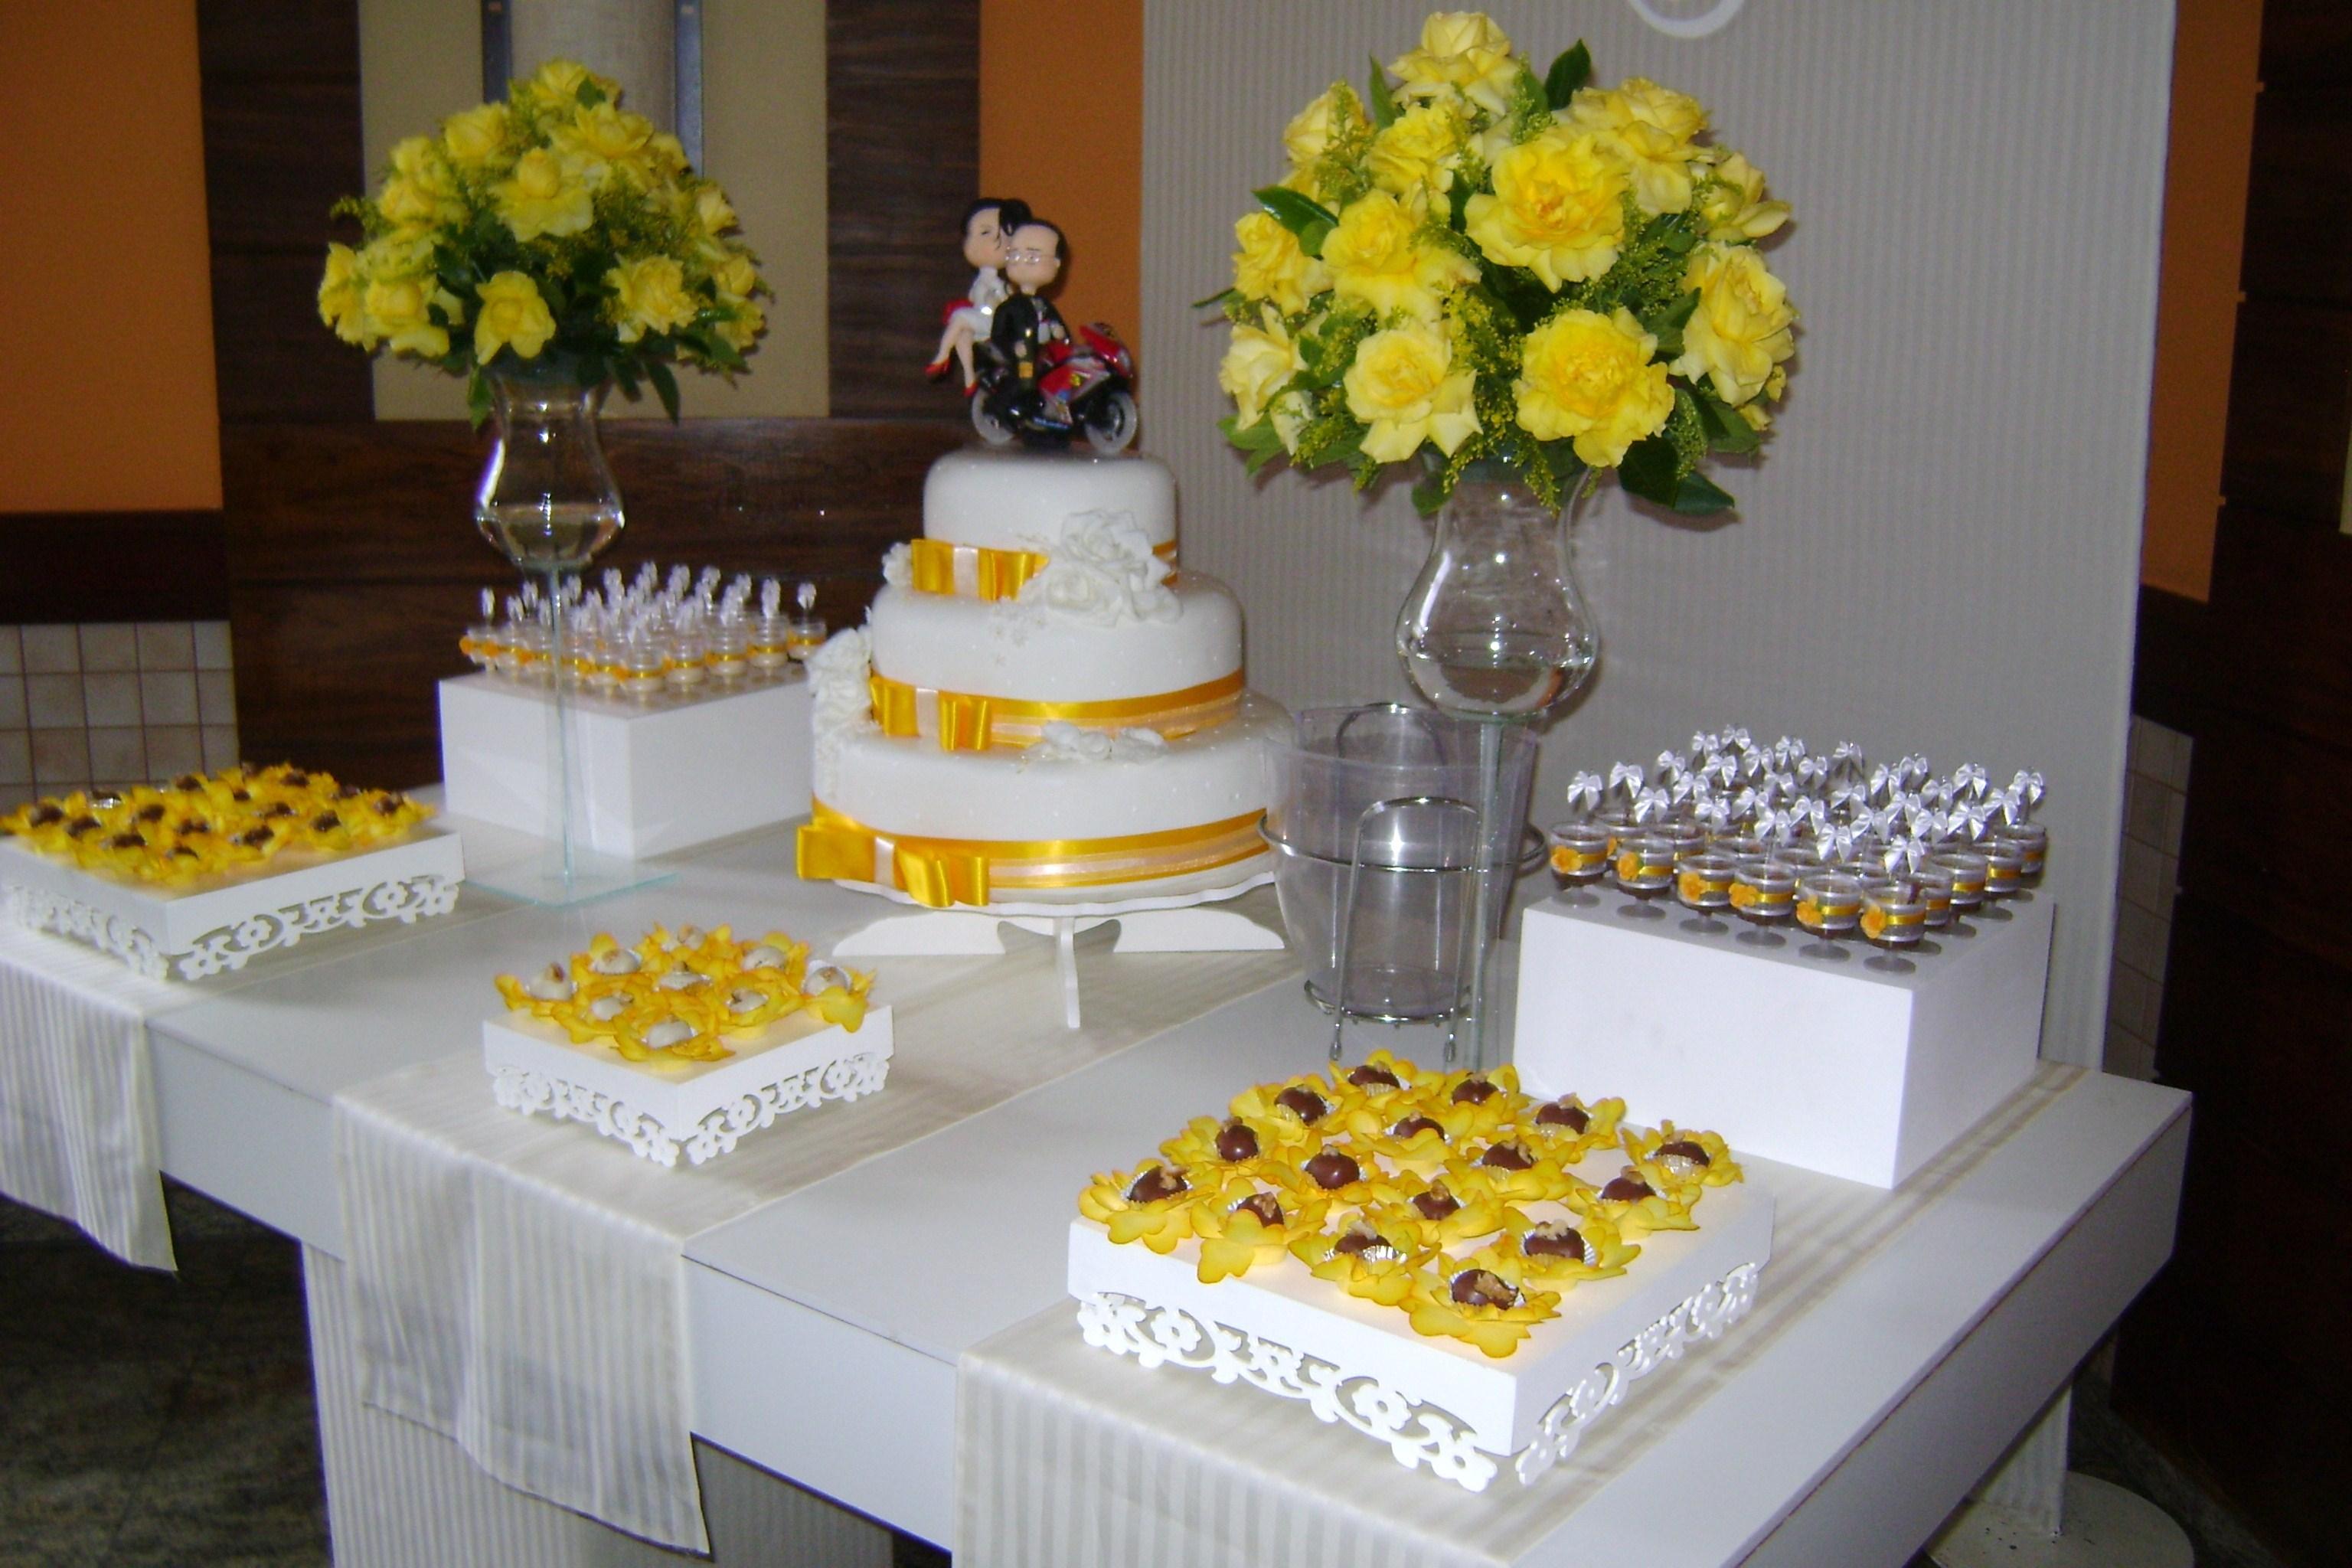 imagens de decoracao de casamento azul e amarelo : imagens de decoracao de casamento azul e amarelo:decoracao-de-casamento-clean decoracao-de-casamento-clean